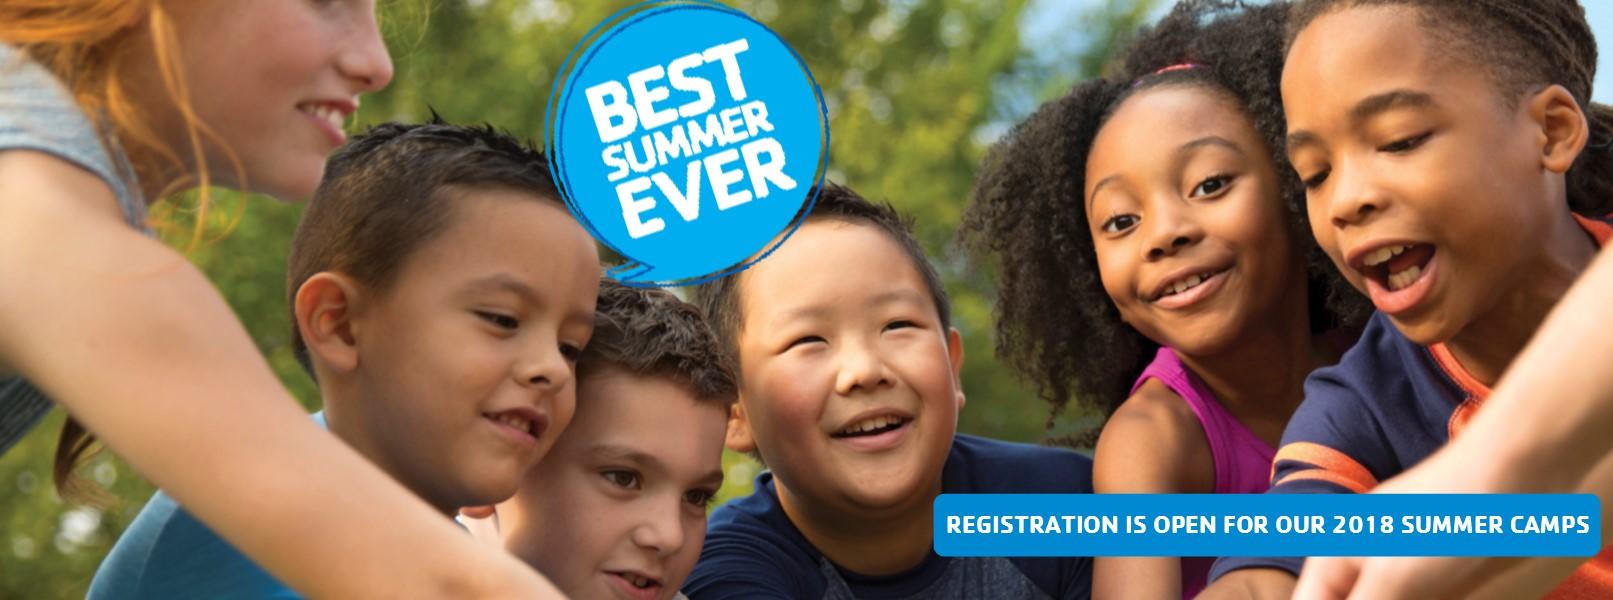 Summer Camp Registration Is Open